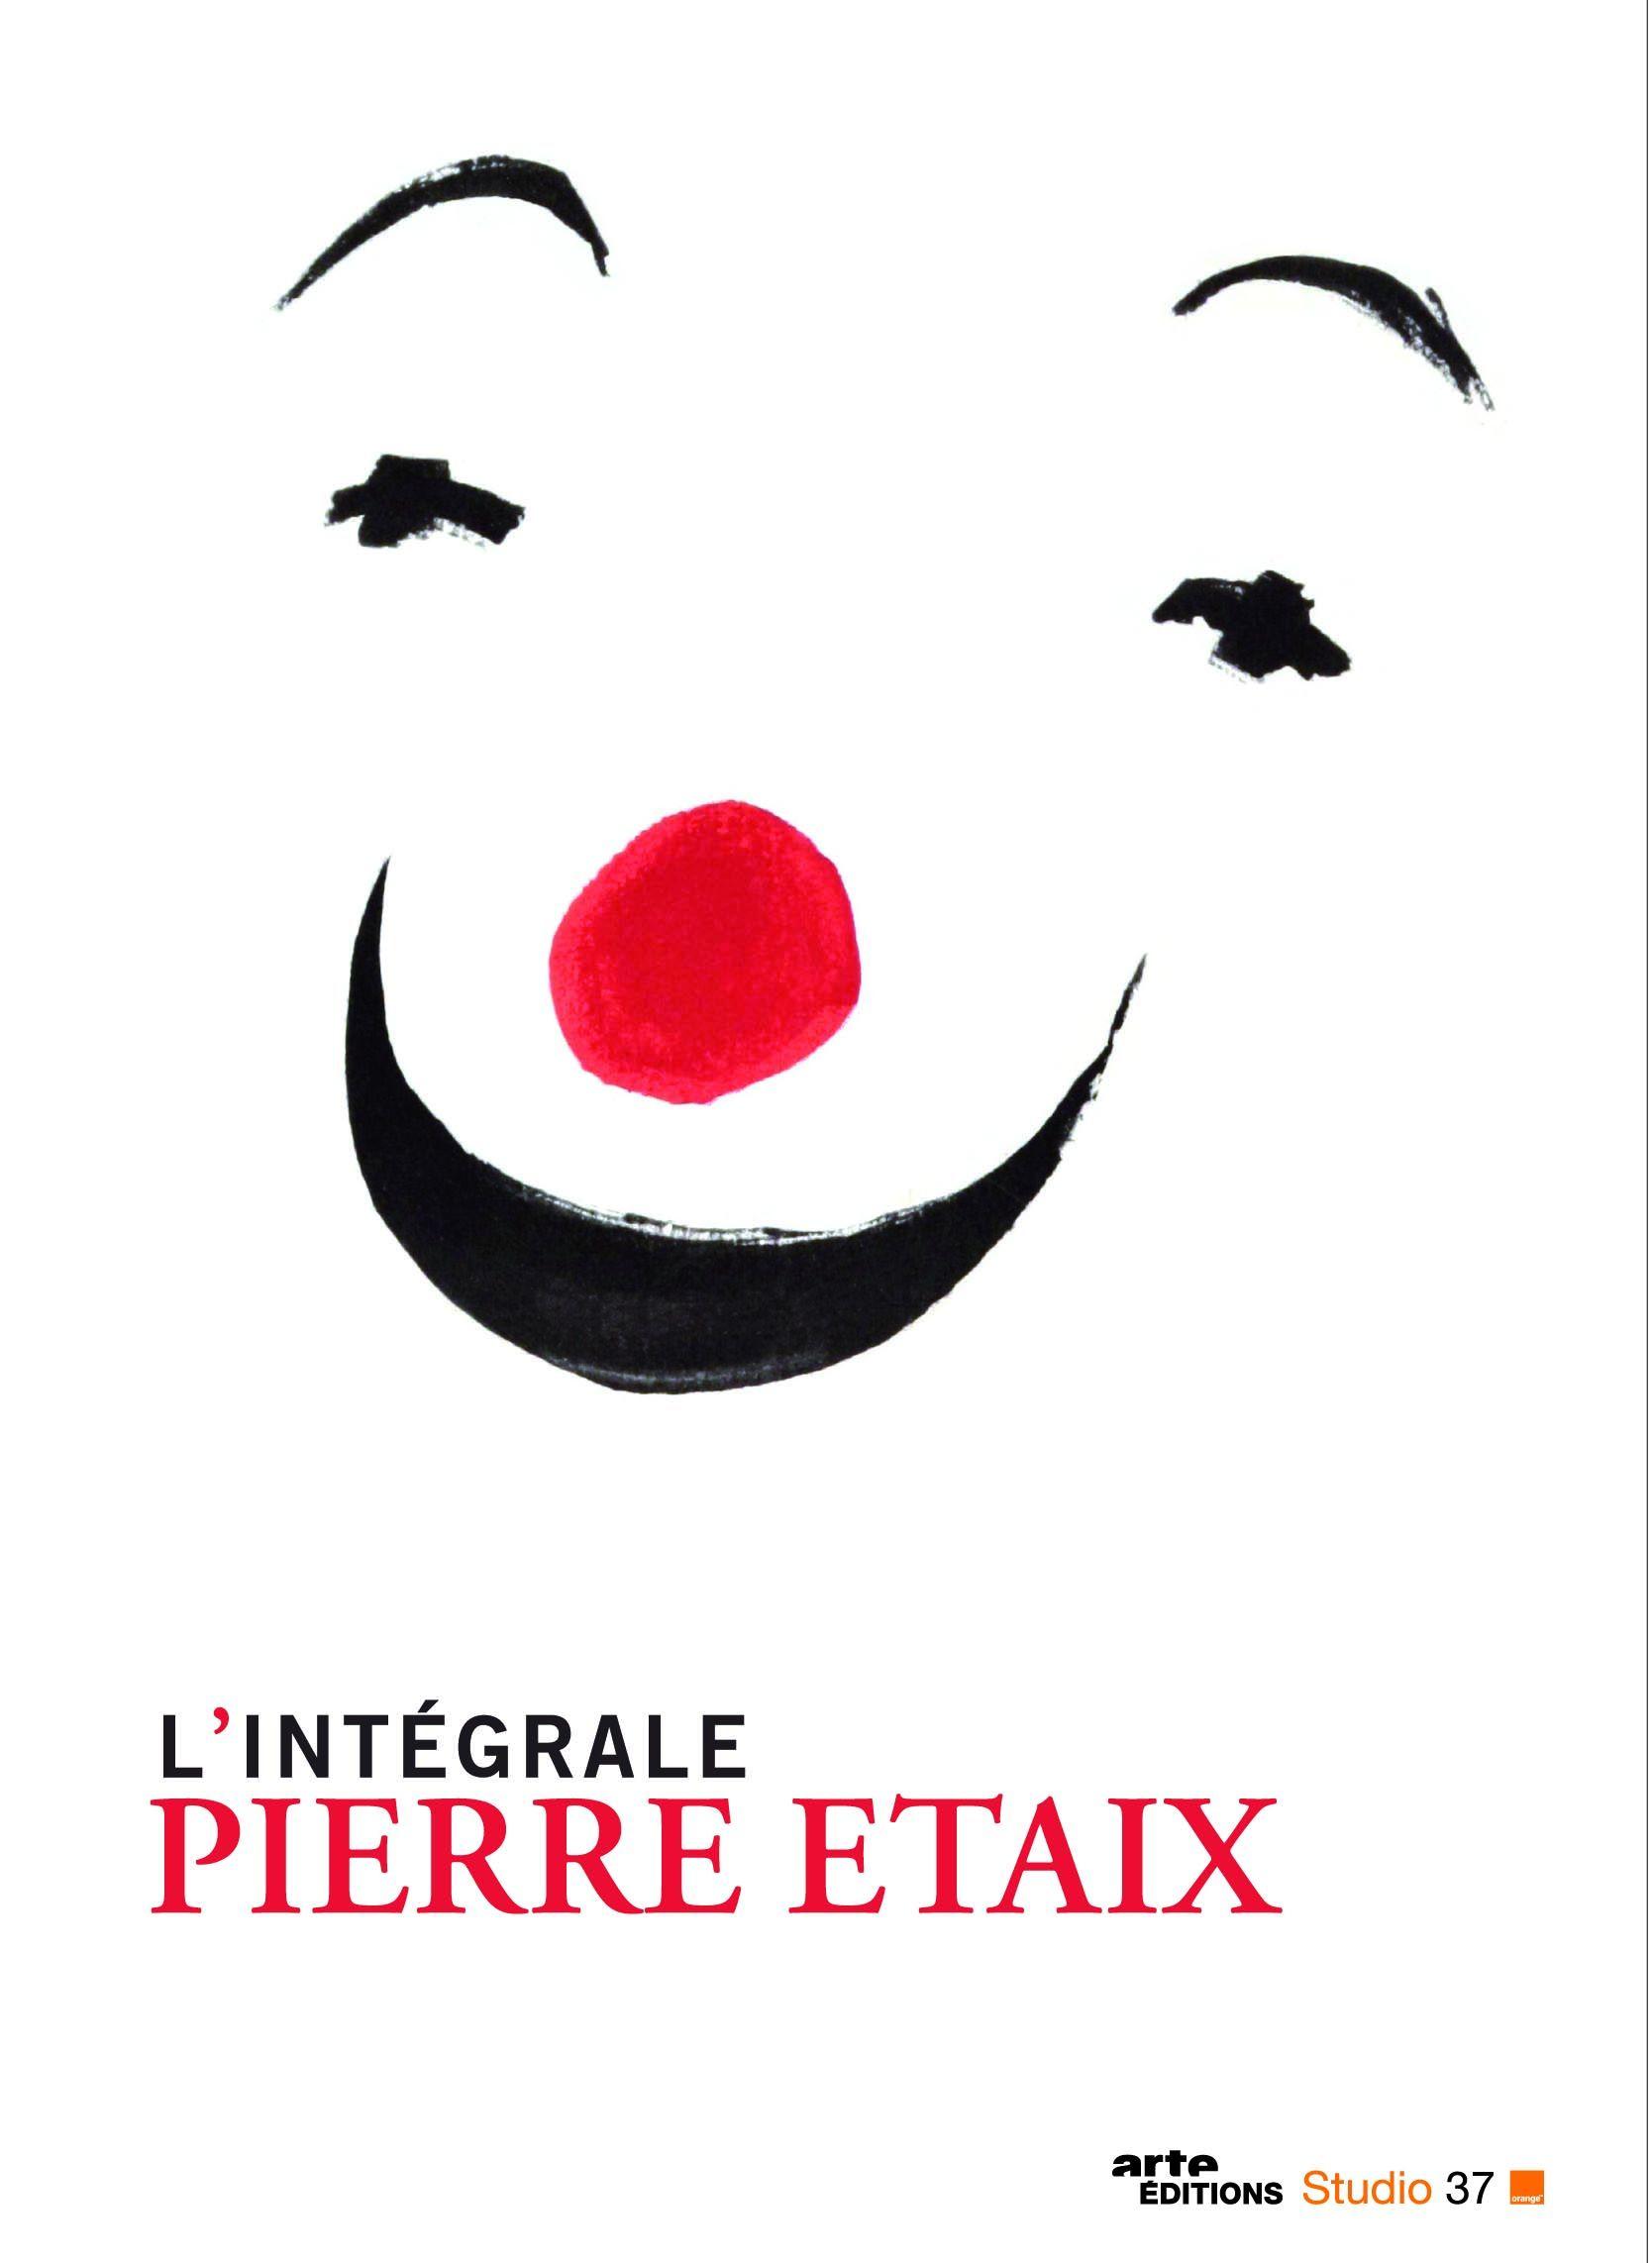 coffret Pierre Etaix